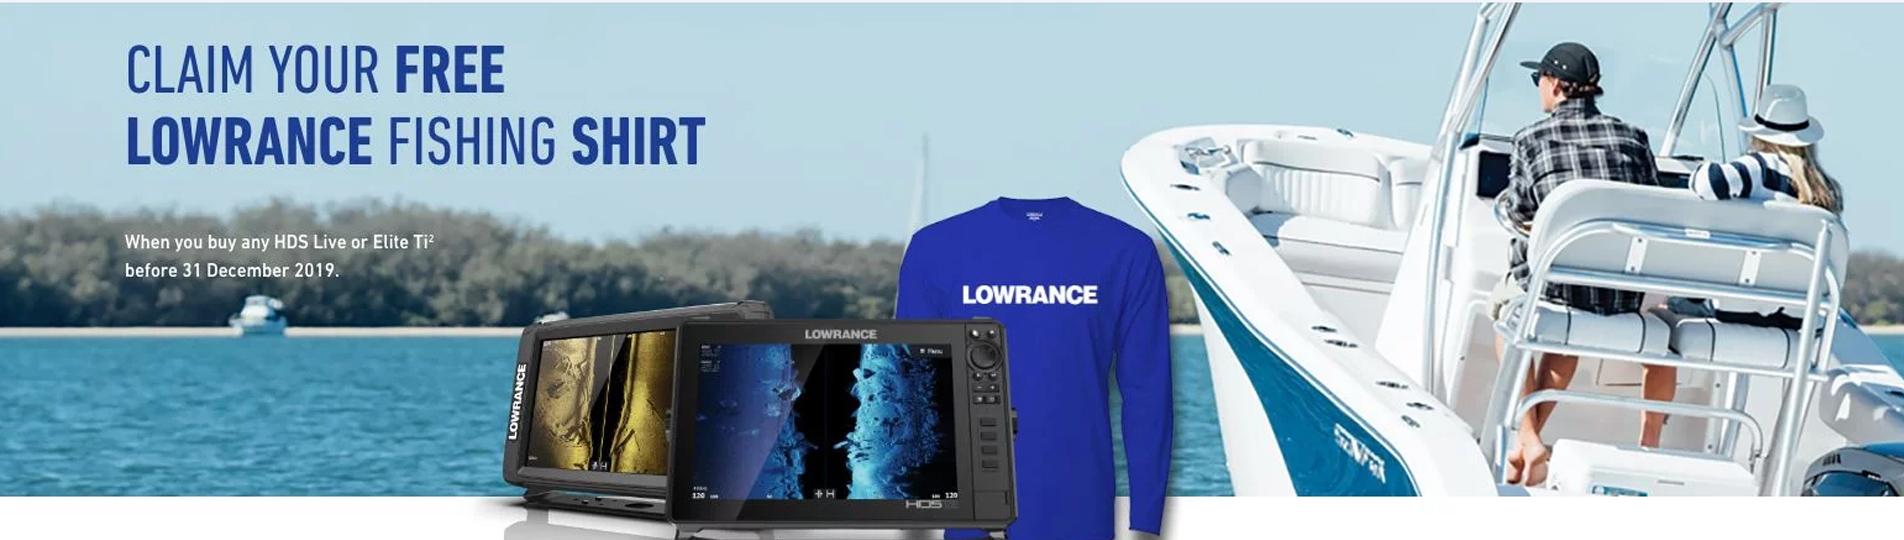 lowrance_shirt